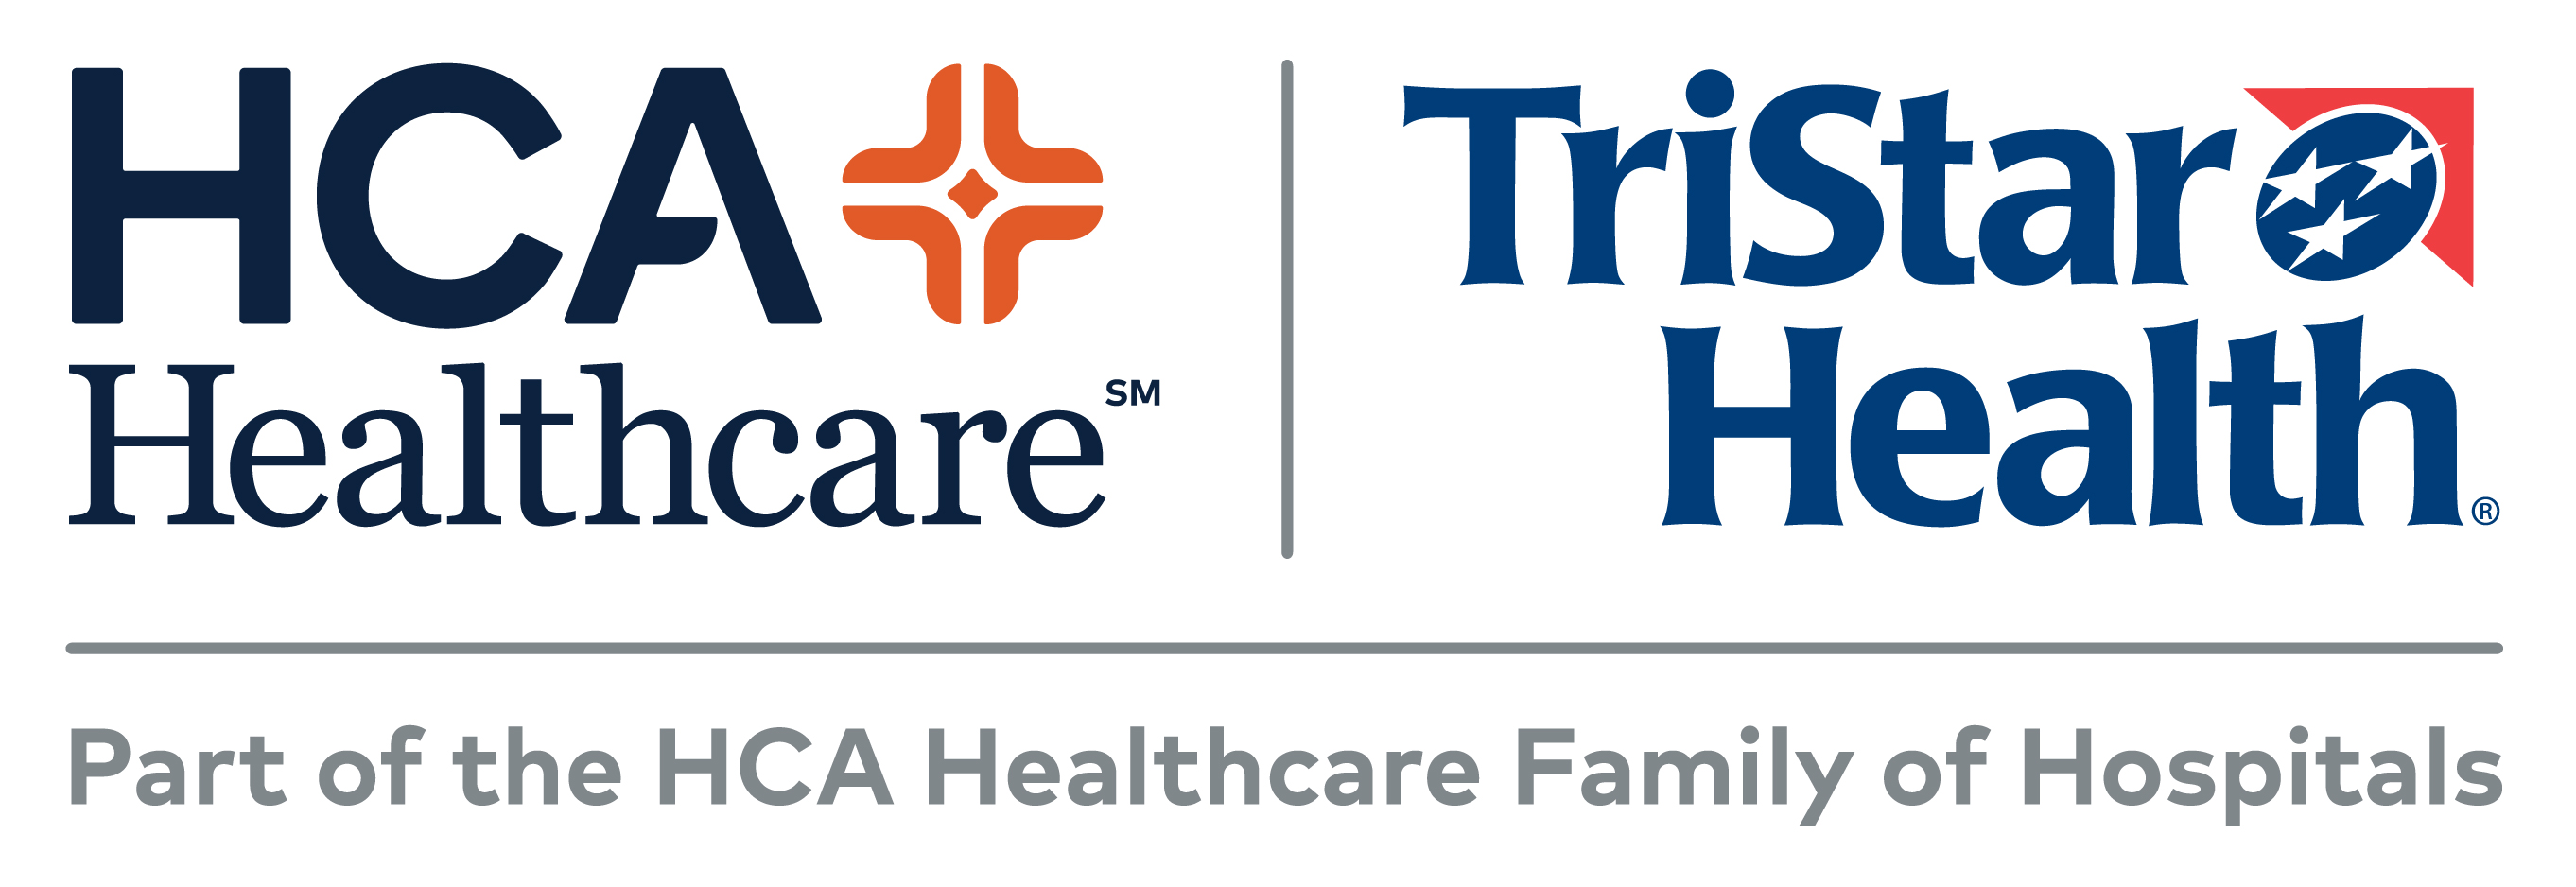 HCAHealthcare-TriStarHealth-Color